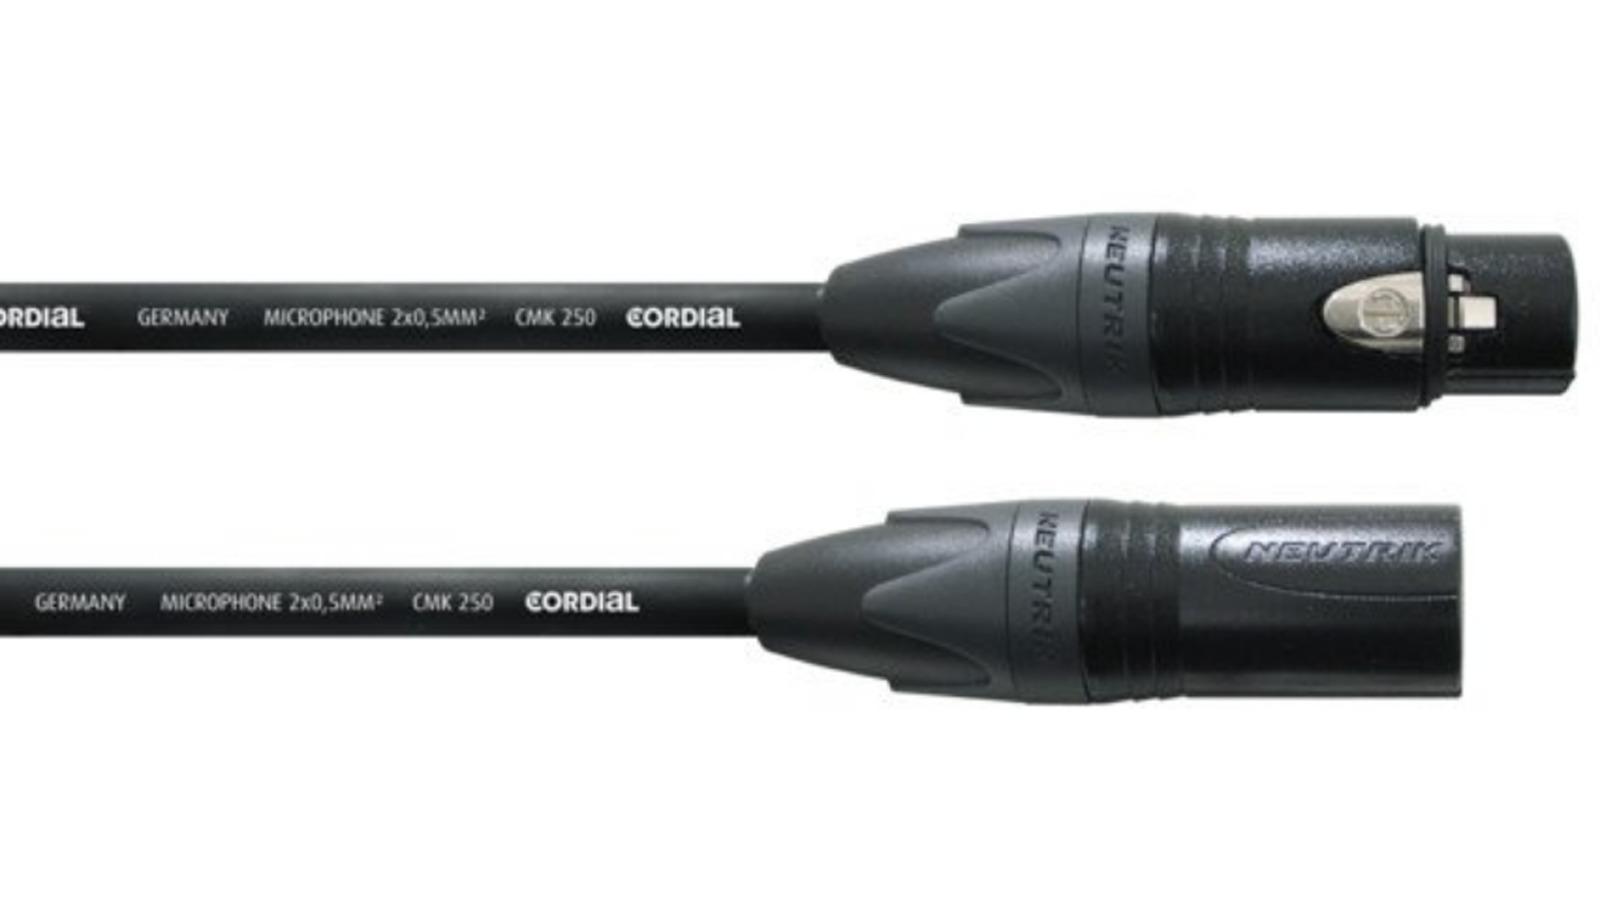 Cordial CSM 10 FM Gold 250 Mikrofon Kabel Studio 10 m